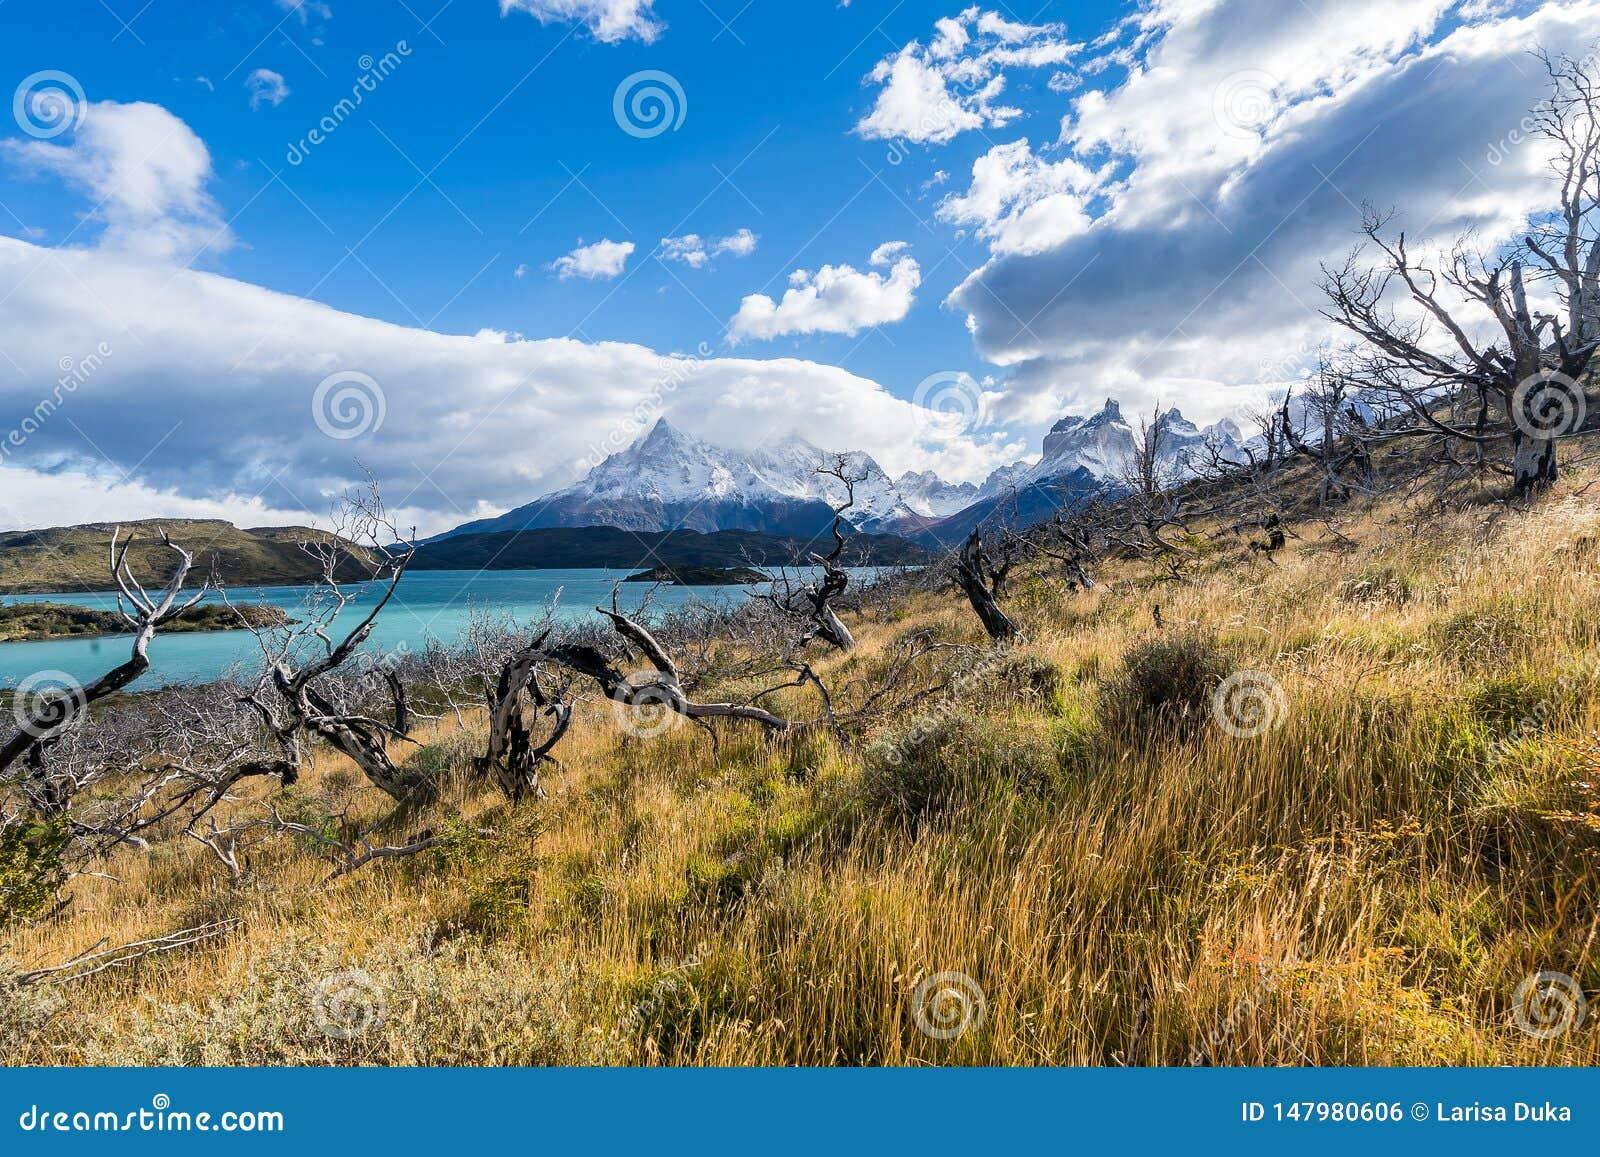 In het Torres del Paine nationale park, Patagoni?, Chili, Lago del Pehoe